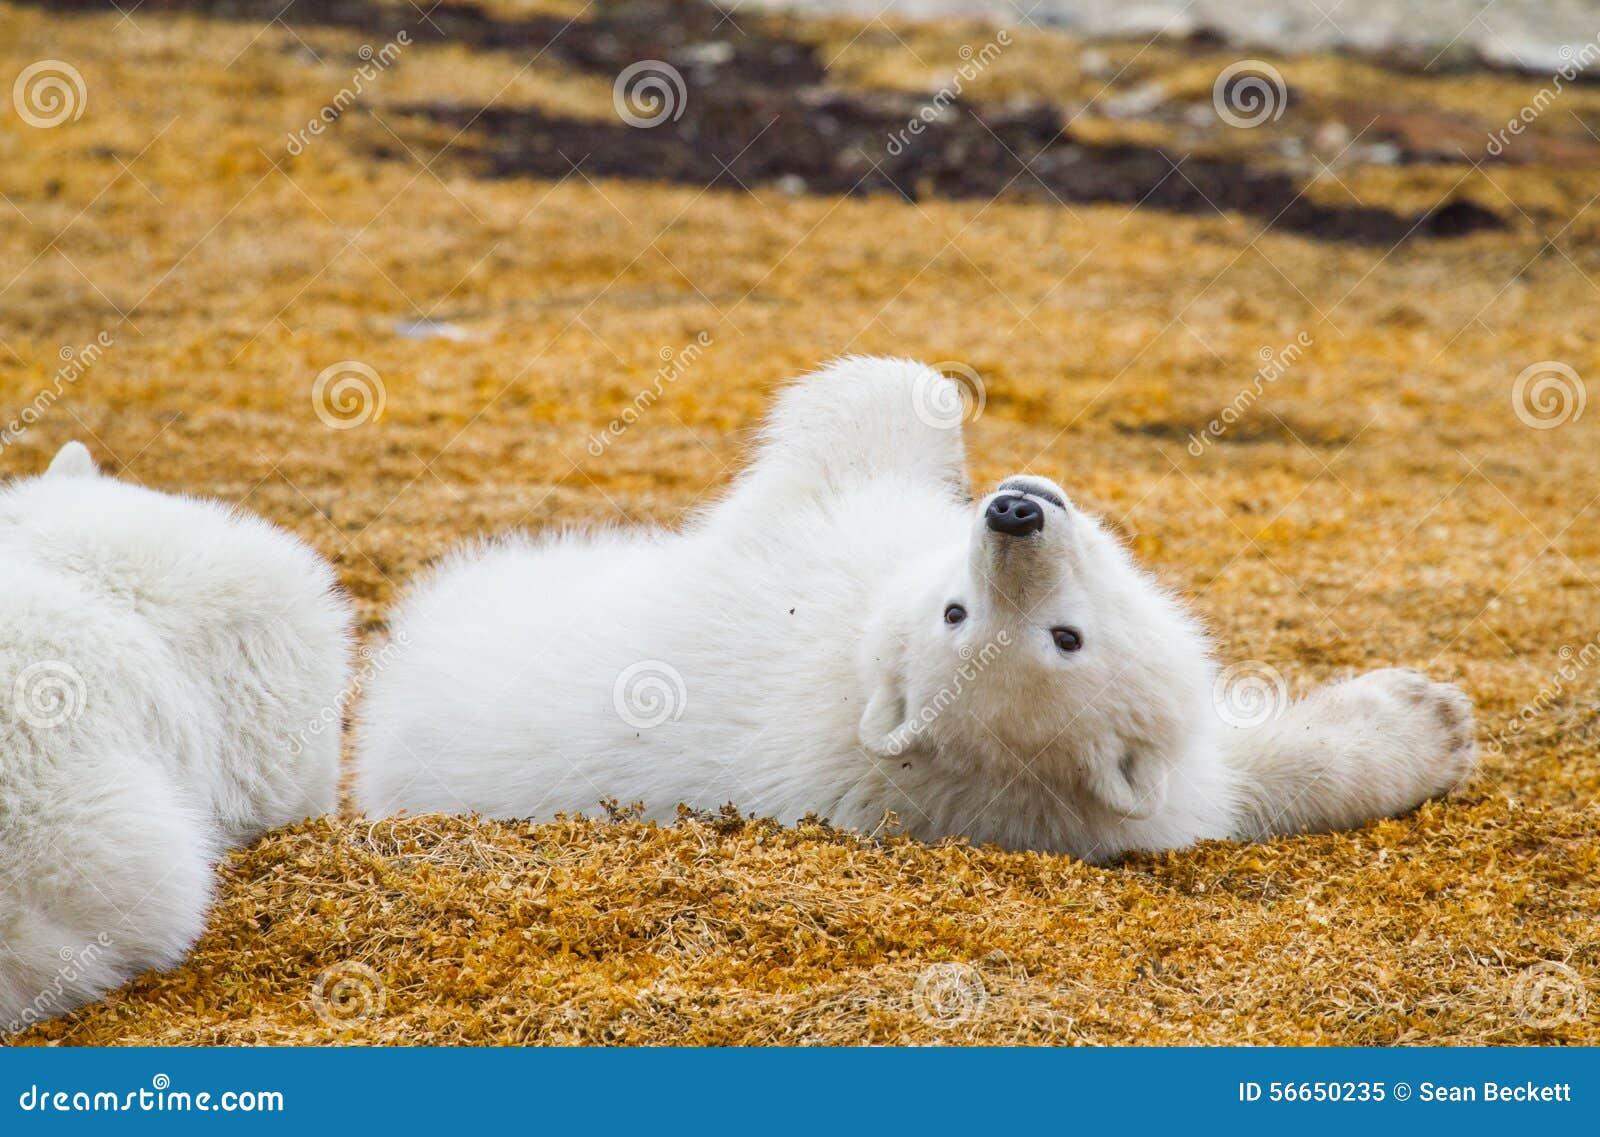 Polar bear cub playing